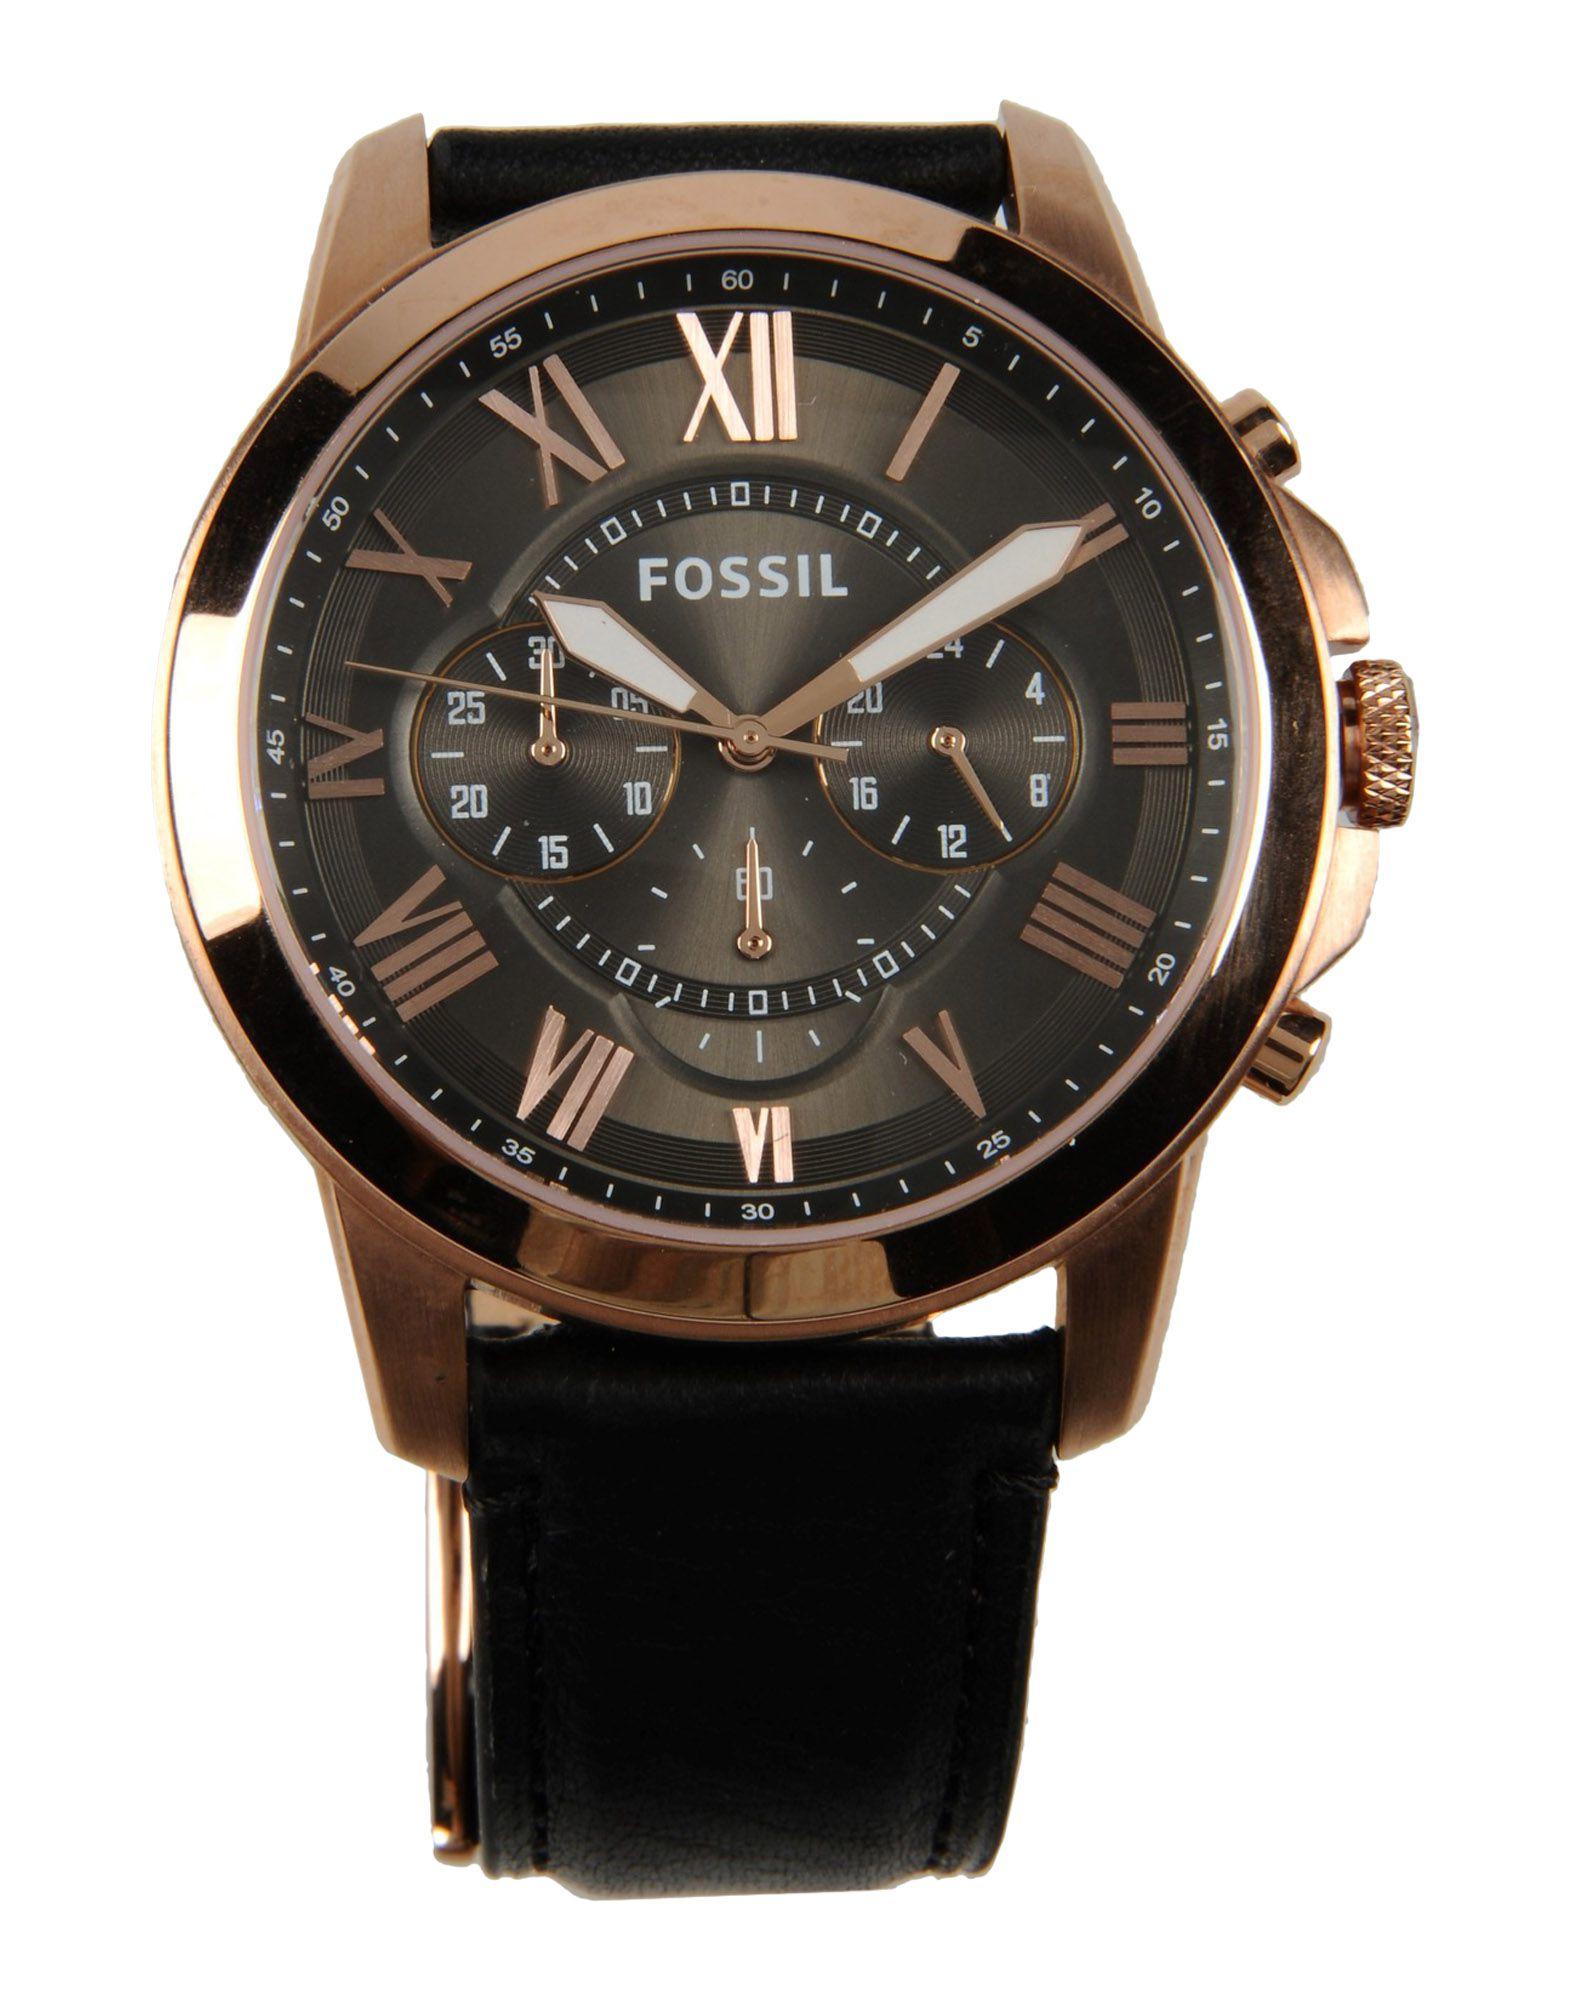 Fossil Leather Wrist Watch in Grey (Metallic) for Men - Lyst